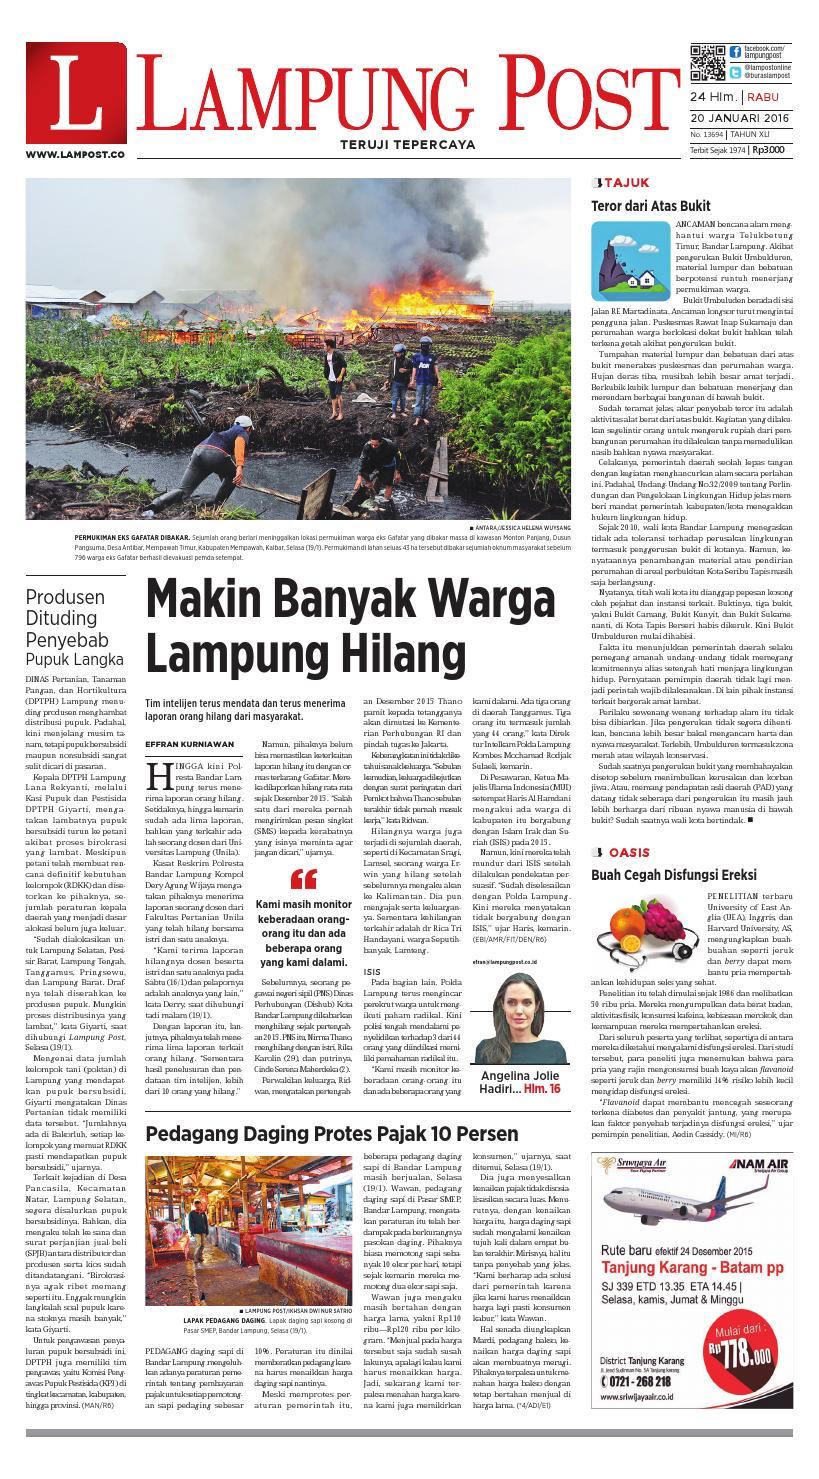 Lampung Post Rabu 20 Januari 2016 By Issuu Keripik Jagung Panggang Pedasmanis Thun Amr